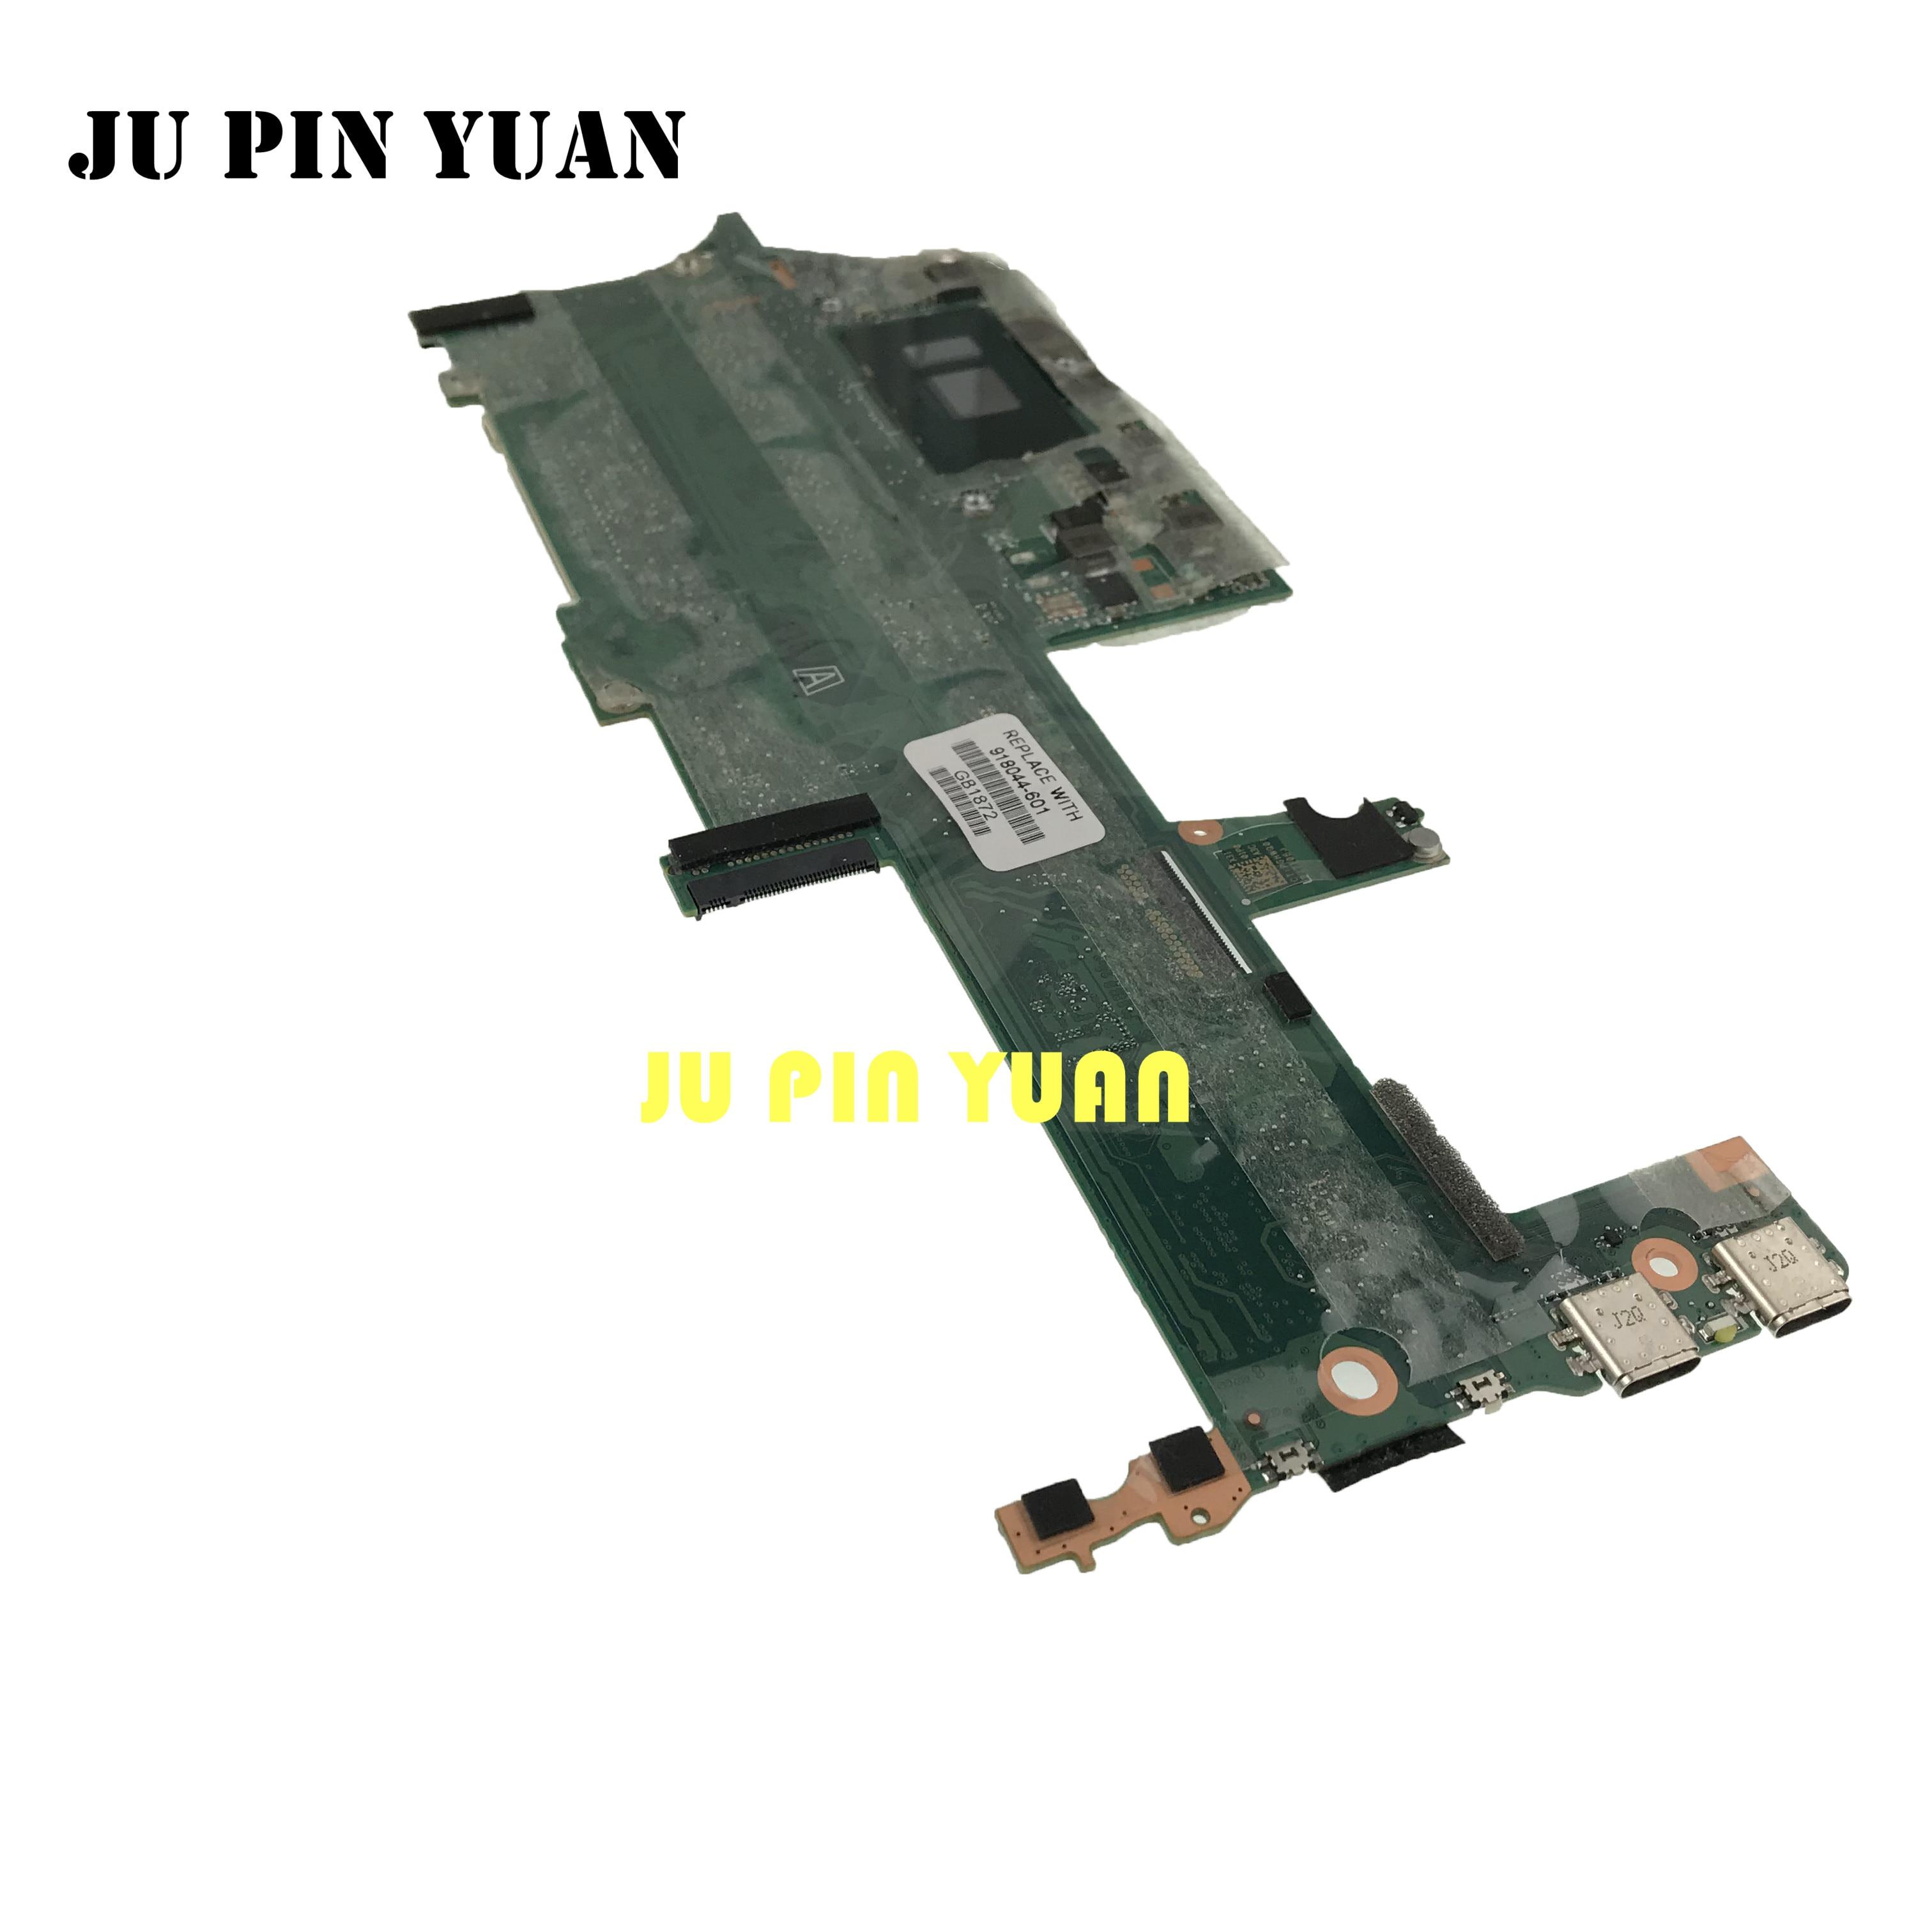 Материнская плата для ноутбука HP Spectre x360 13-AC 13T-AC 918044-601 918044-001, DAX31MB1AA0 с процессором i5-7200U, 8 ГБ, полностью протестирована